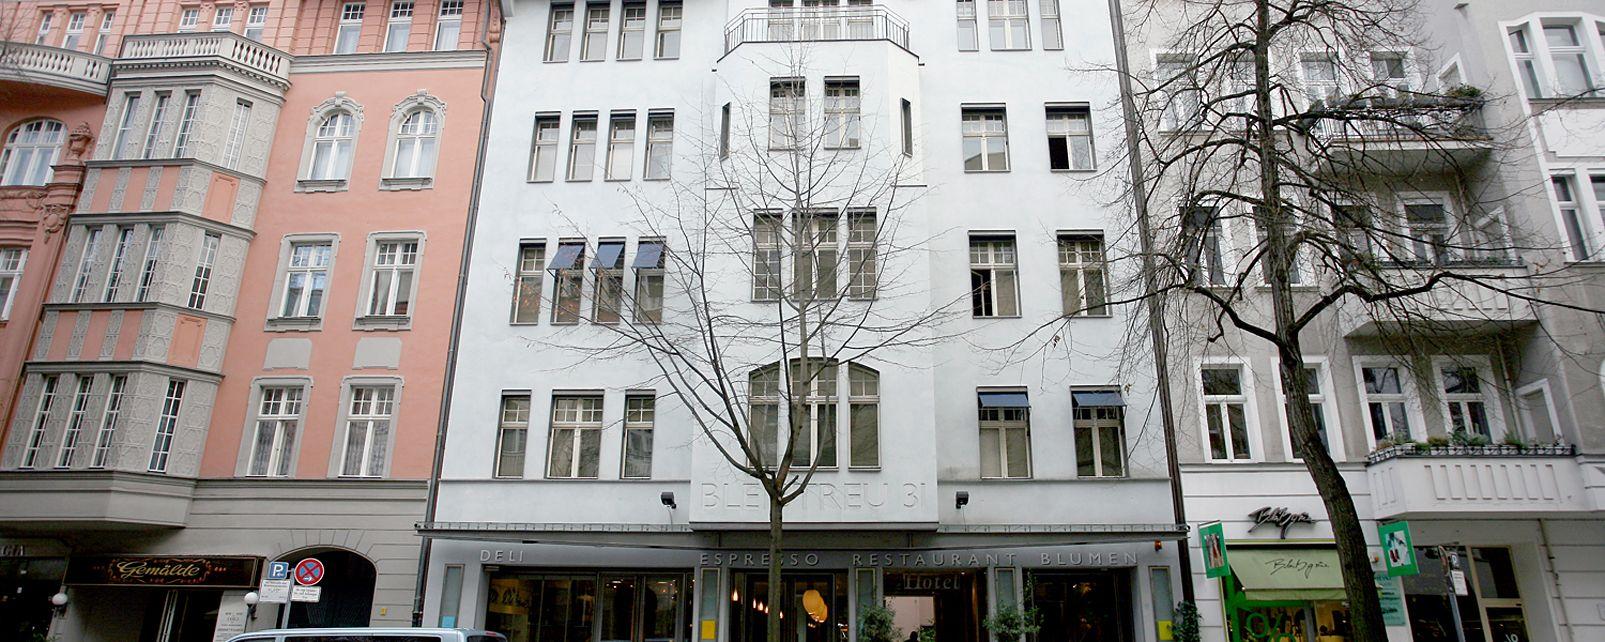 Hôtel Bleibtreu Berlin